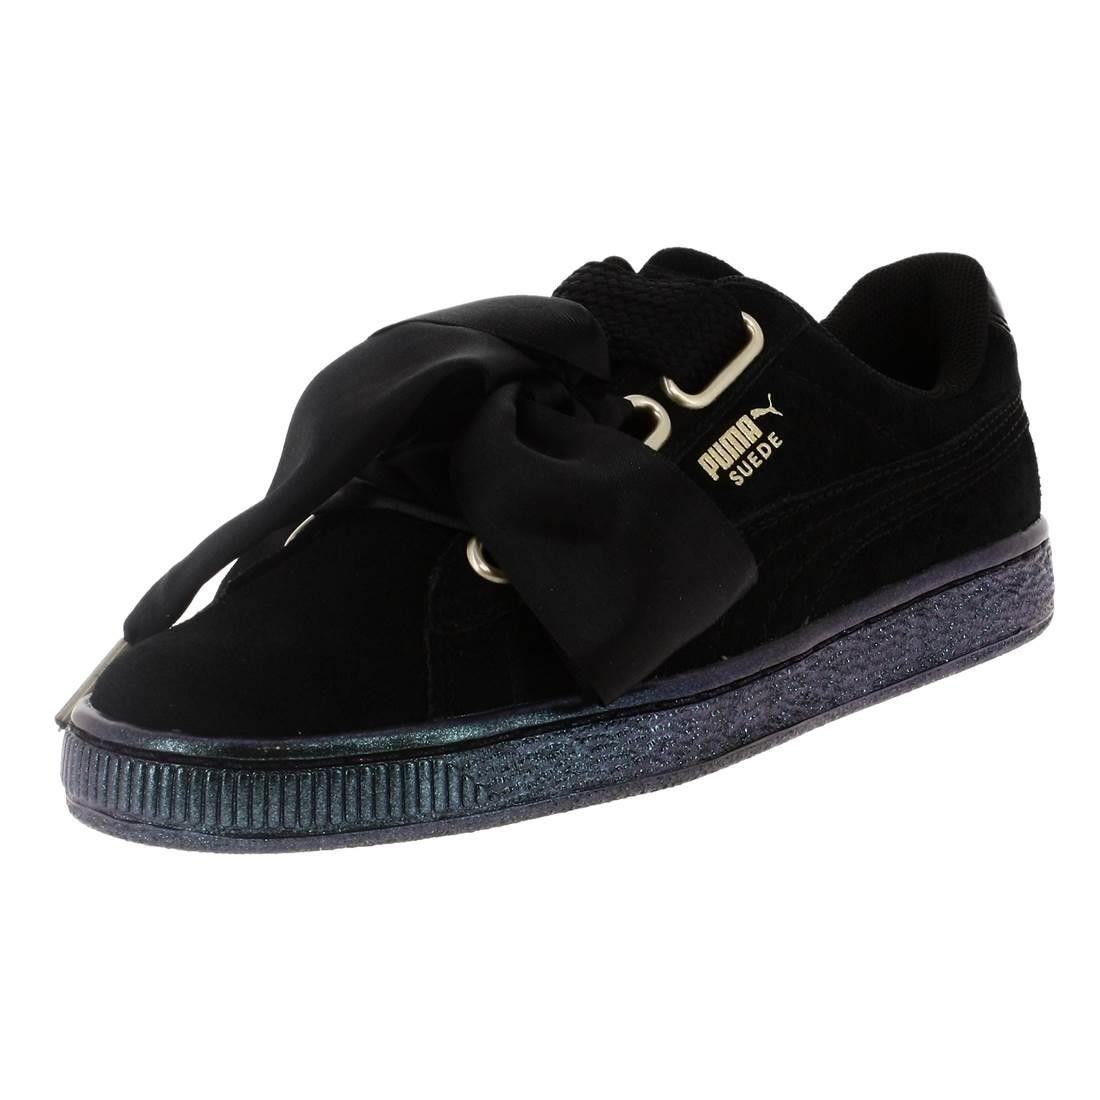 Satin ShoesSandals Suede Femme 362714En 2019 Heart Puma jMSLpGUzqV